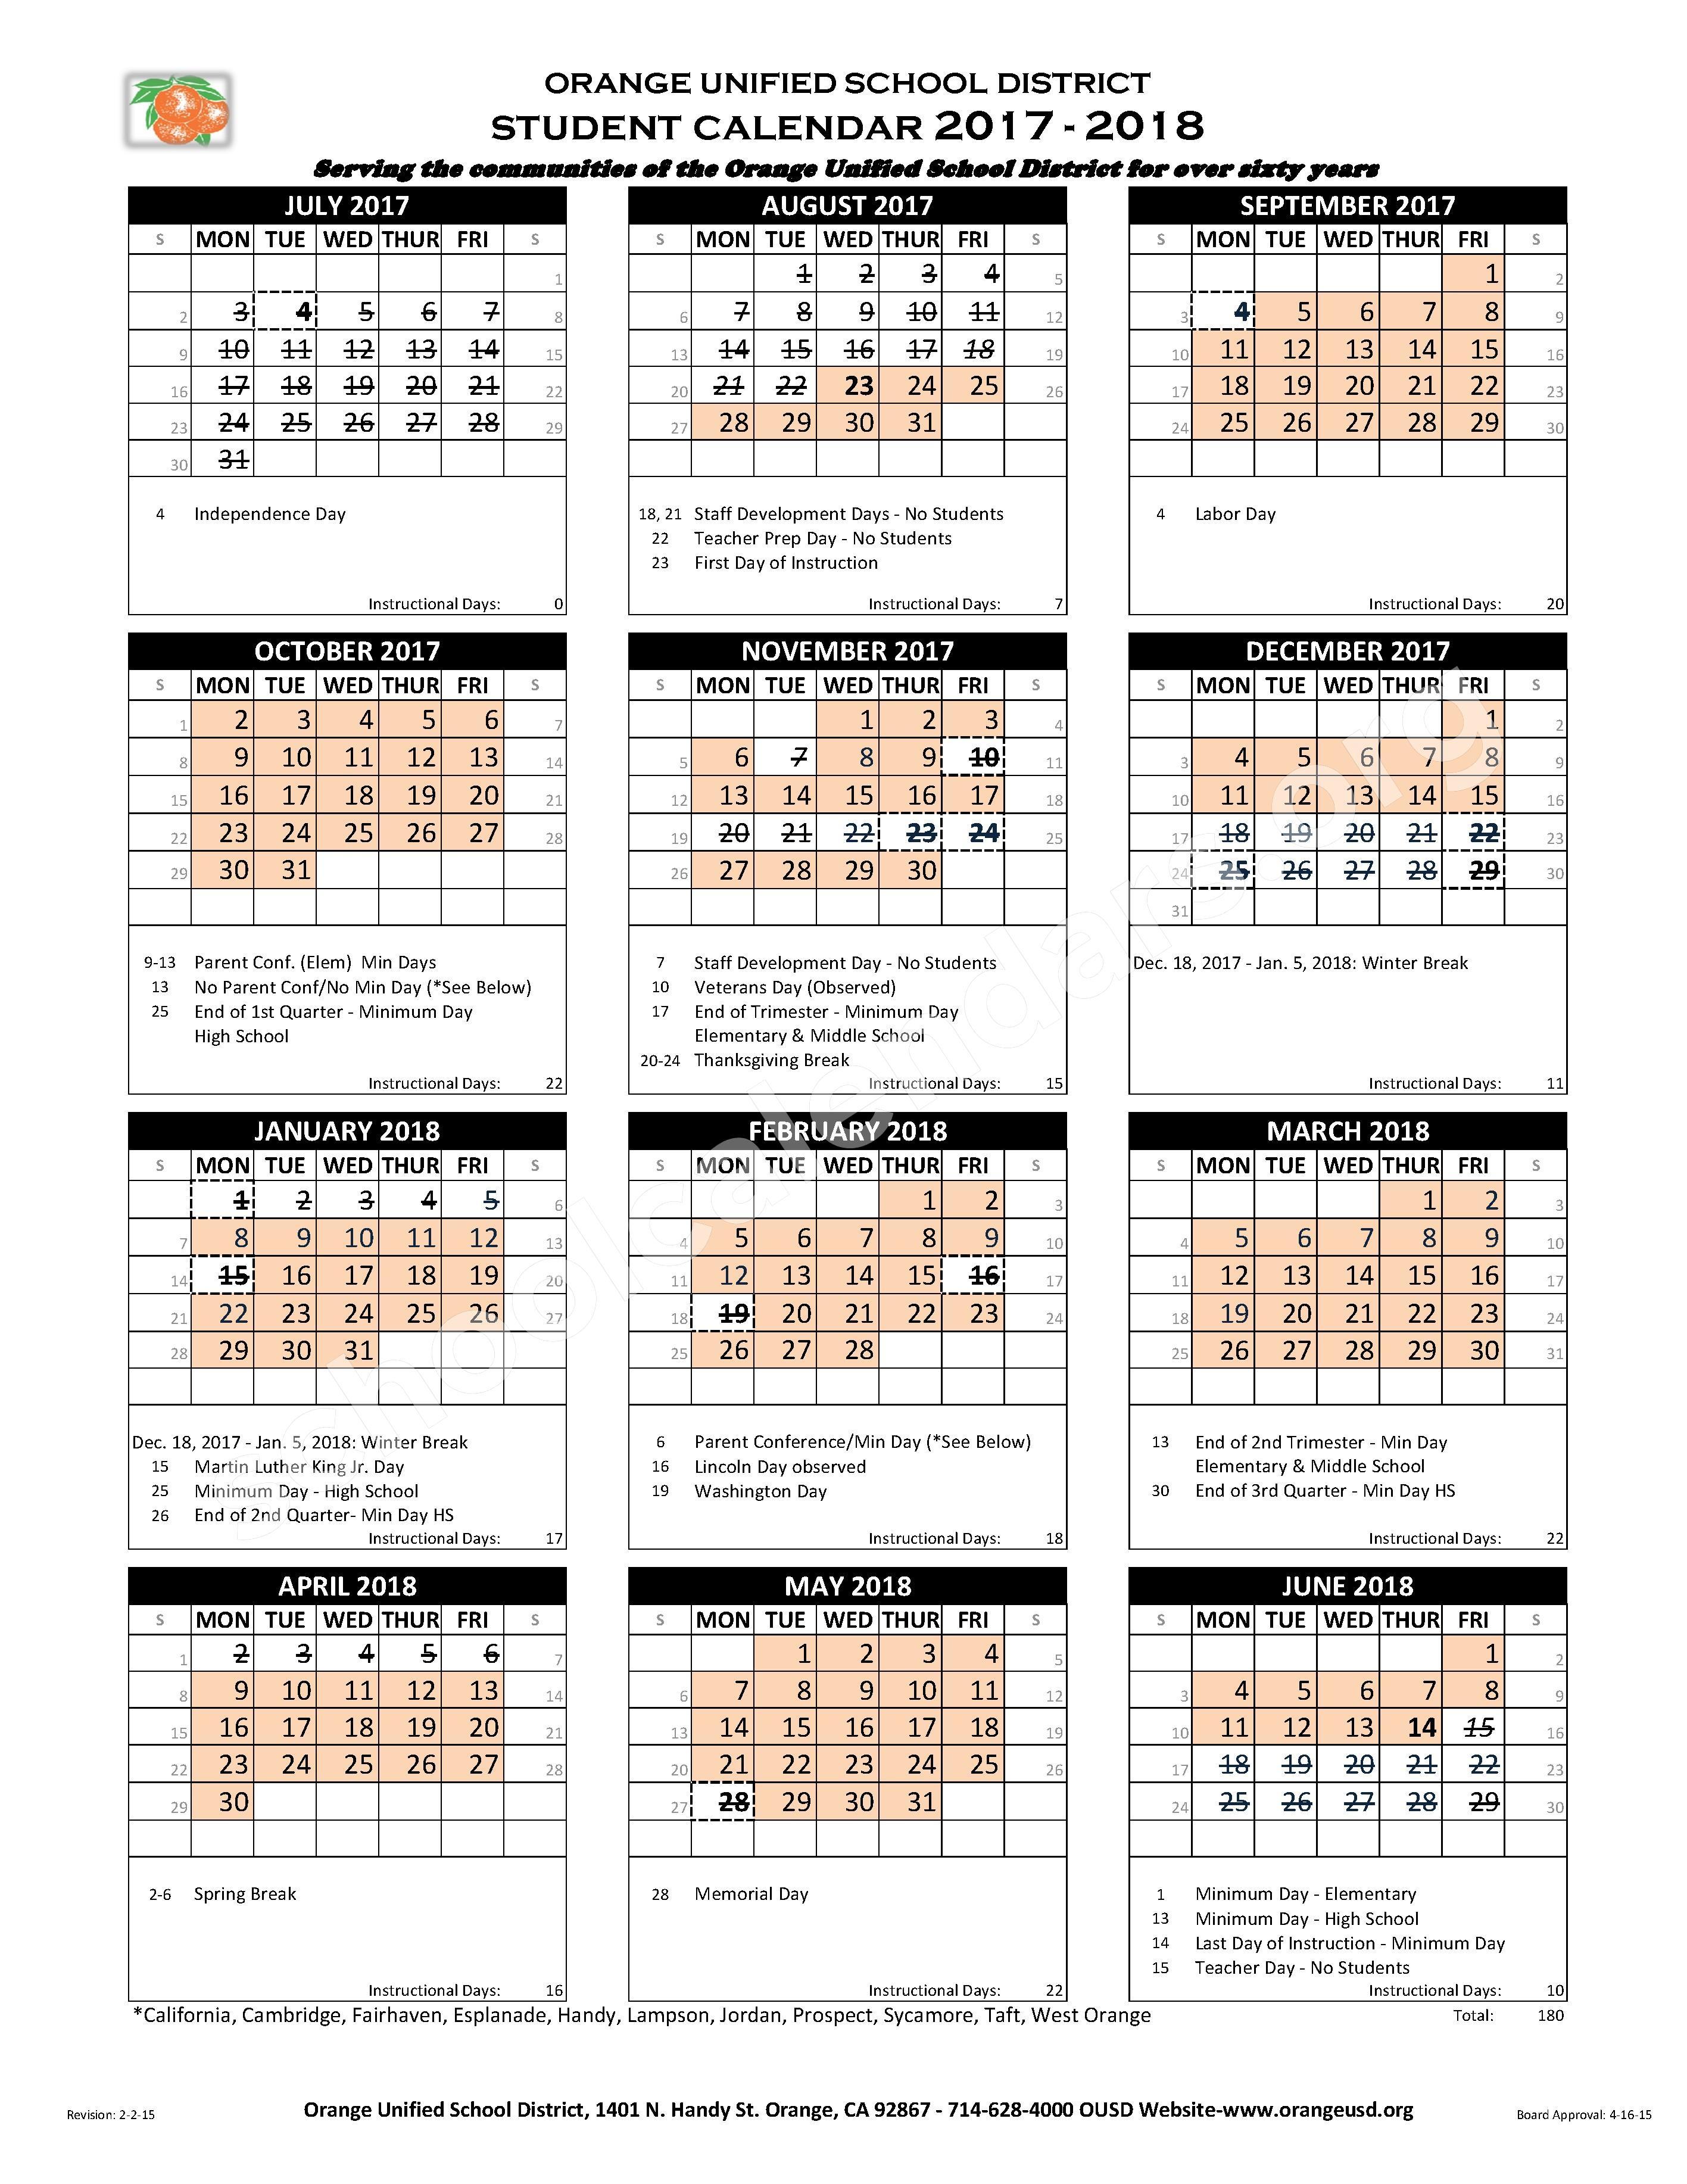 Orange Unified School District Calendars – Orange, CA